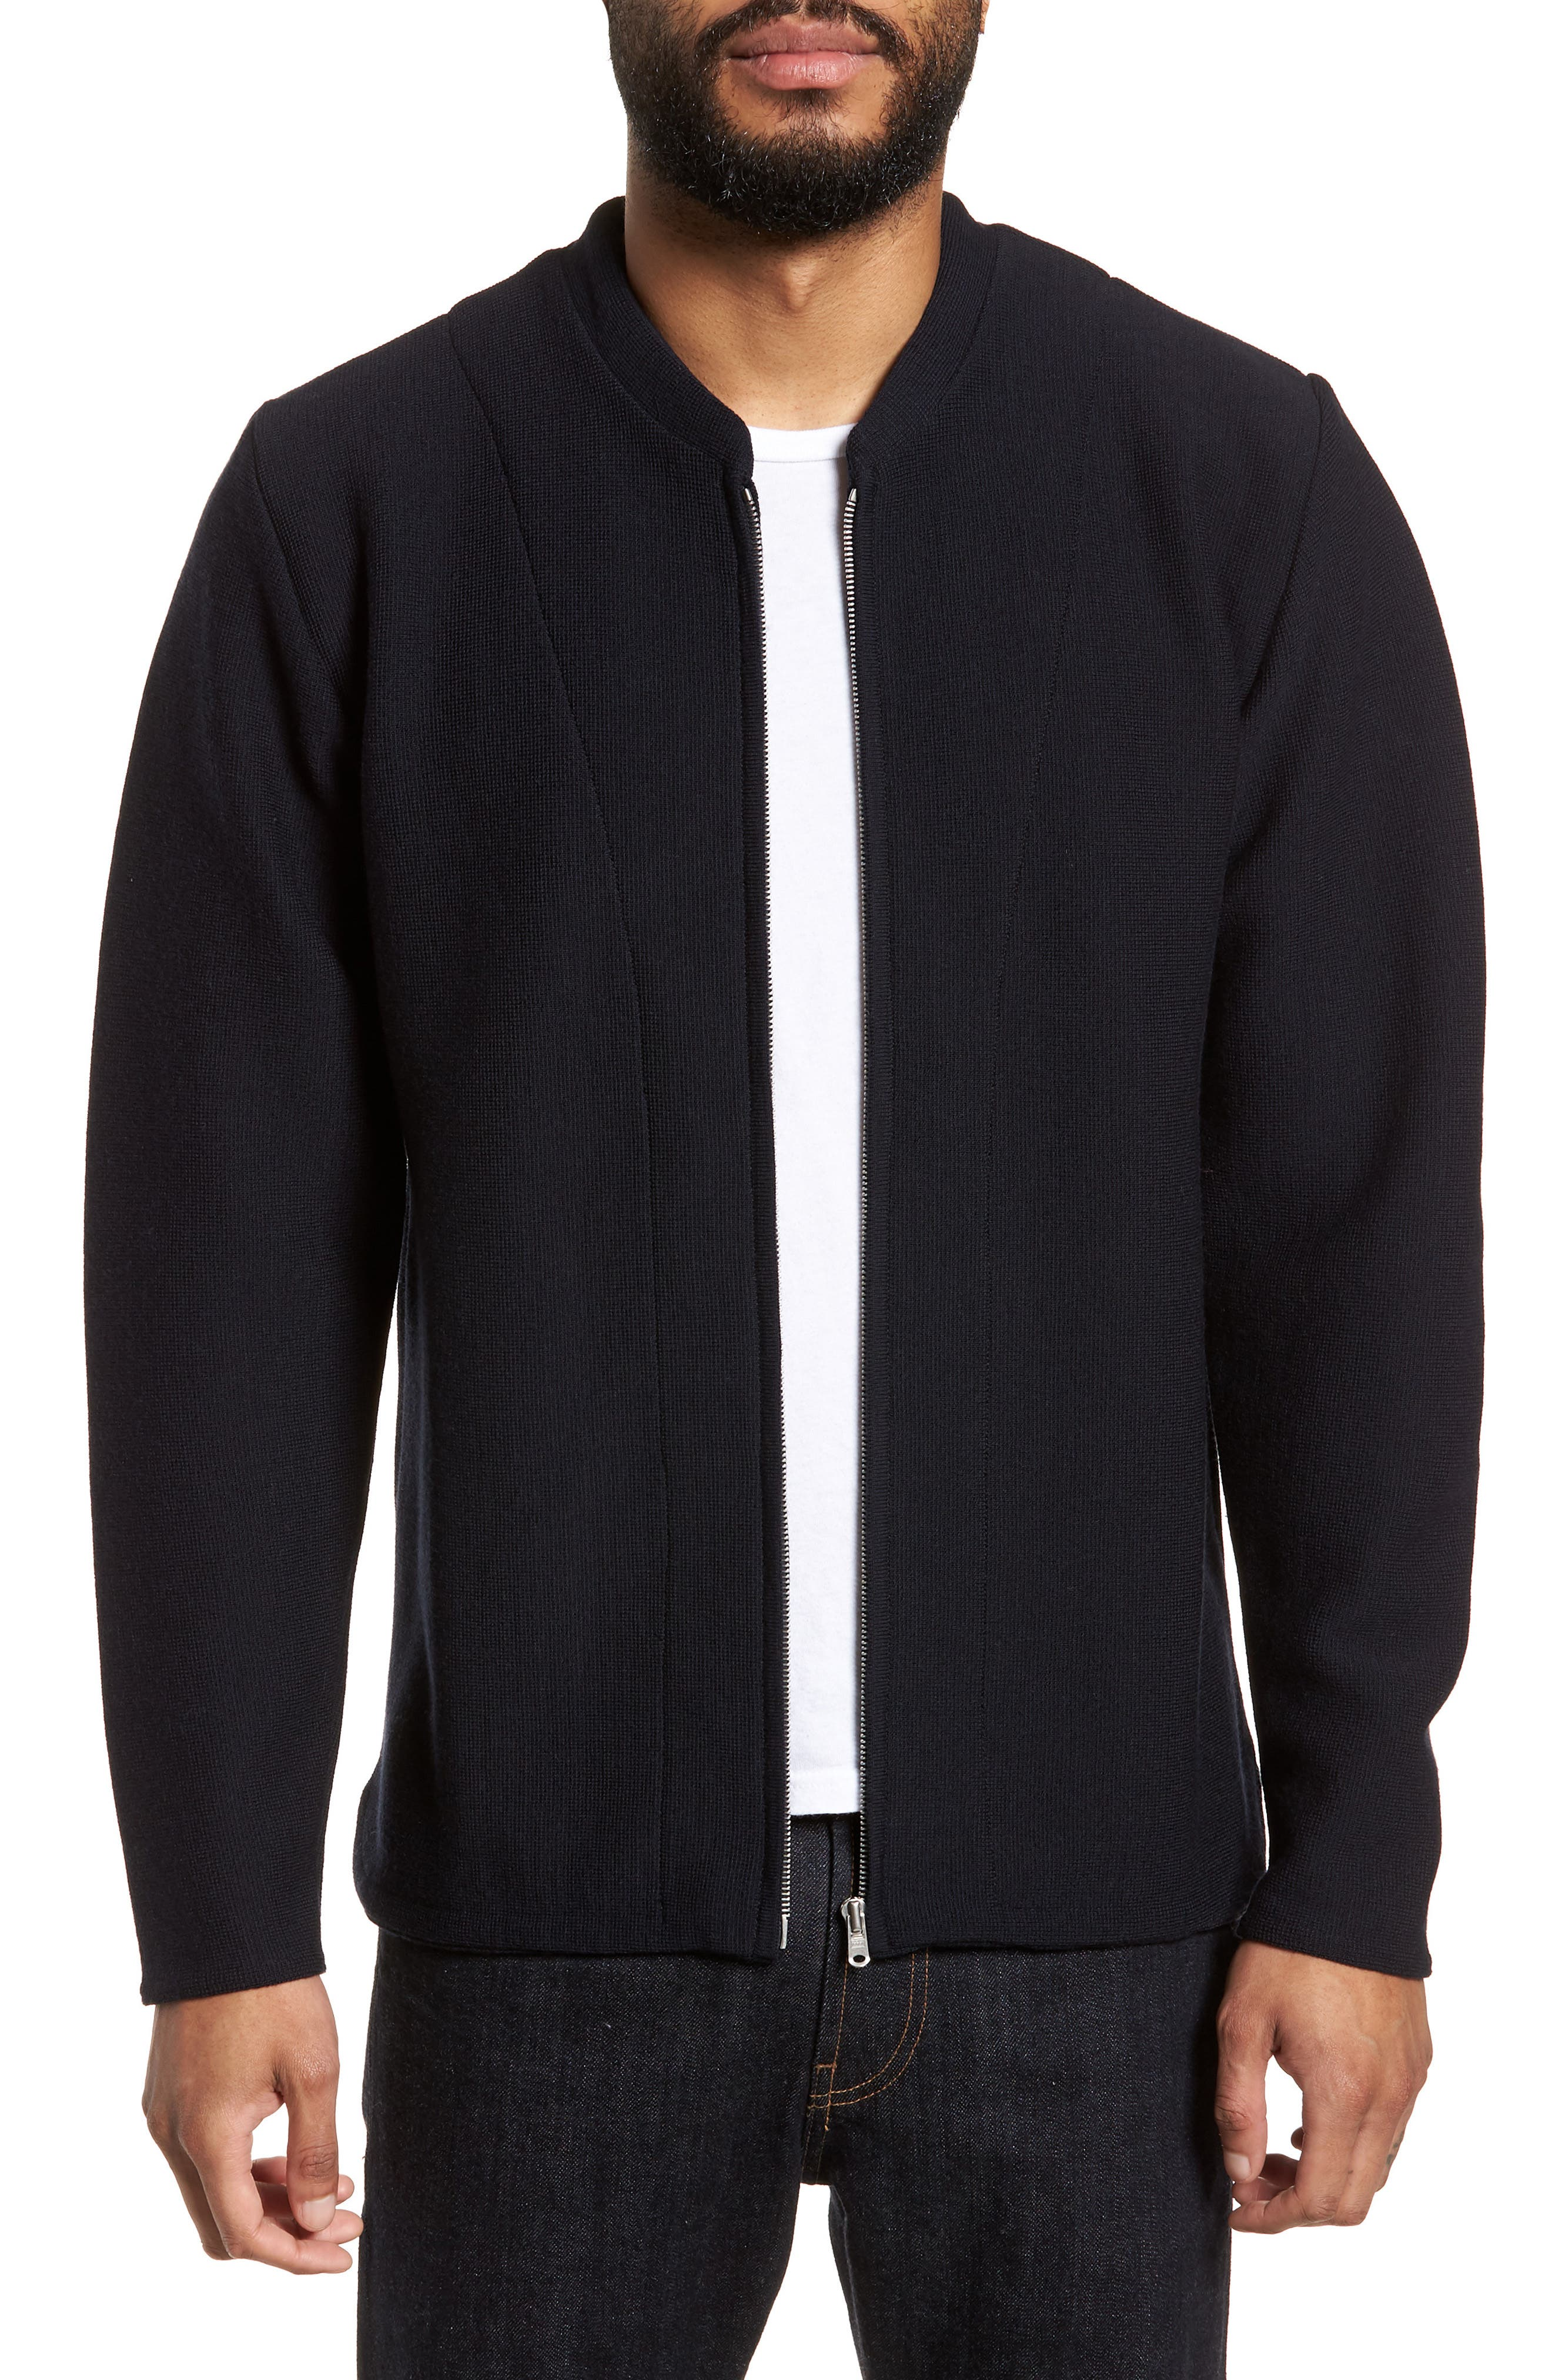 Black wool sweater coat